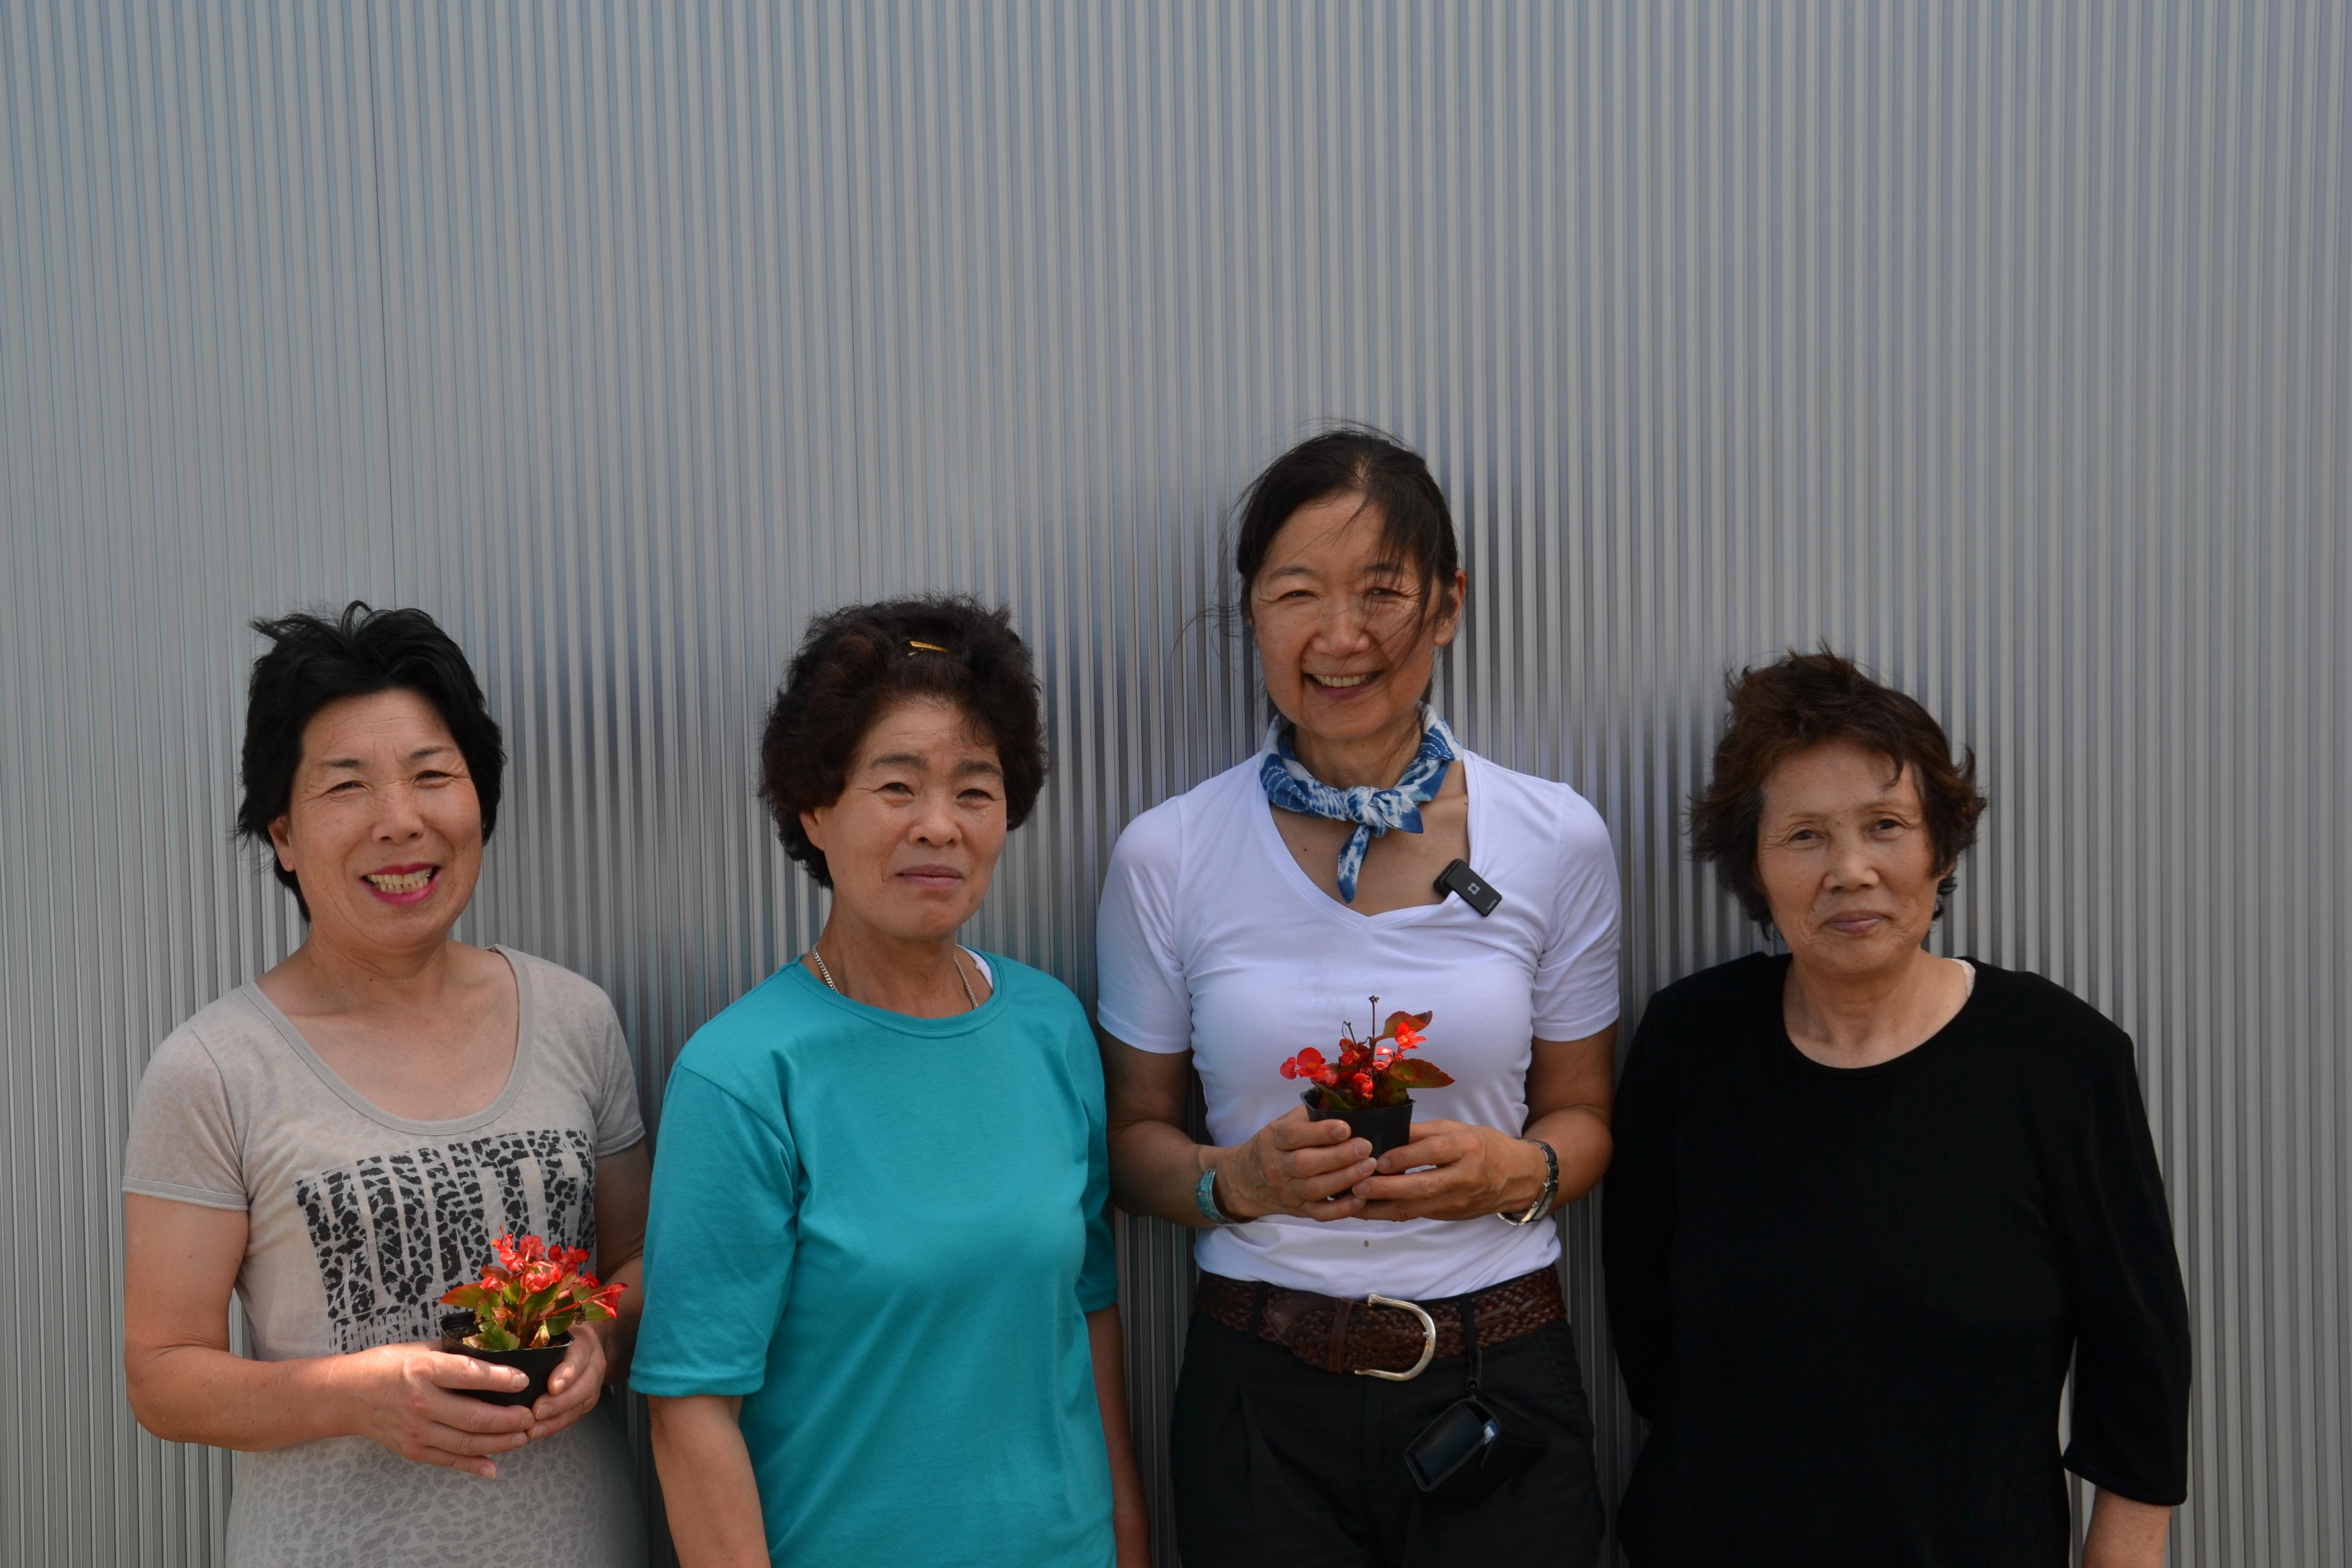 sendai kasetsu women linda plant flowers.JPG